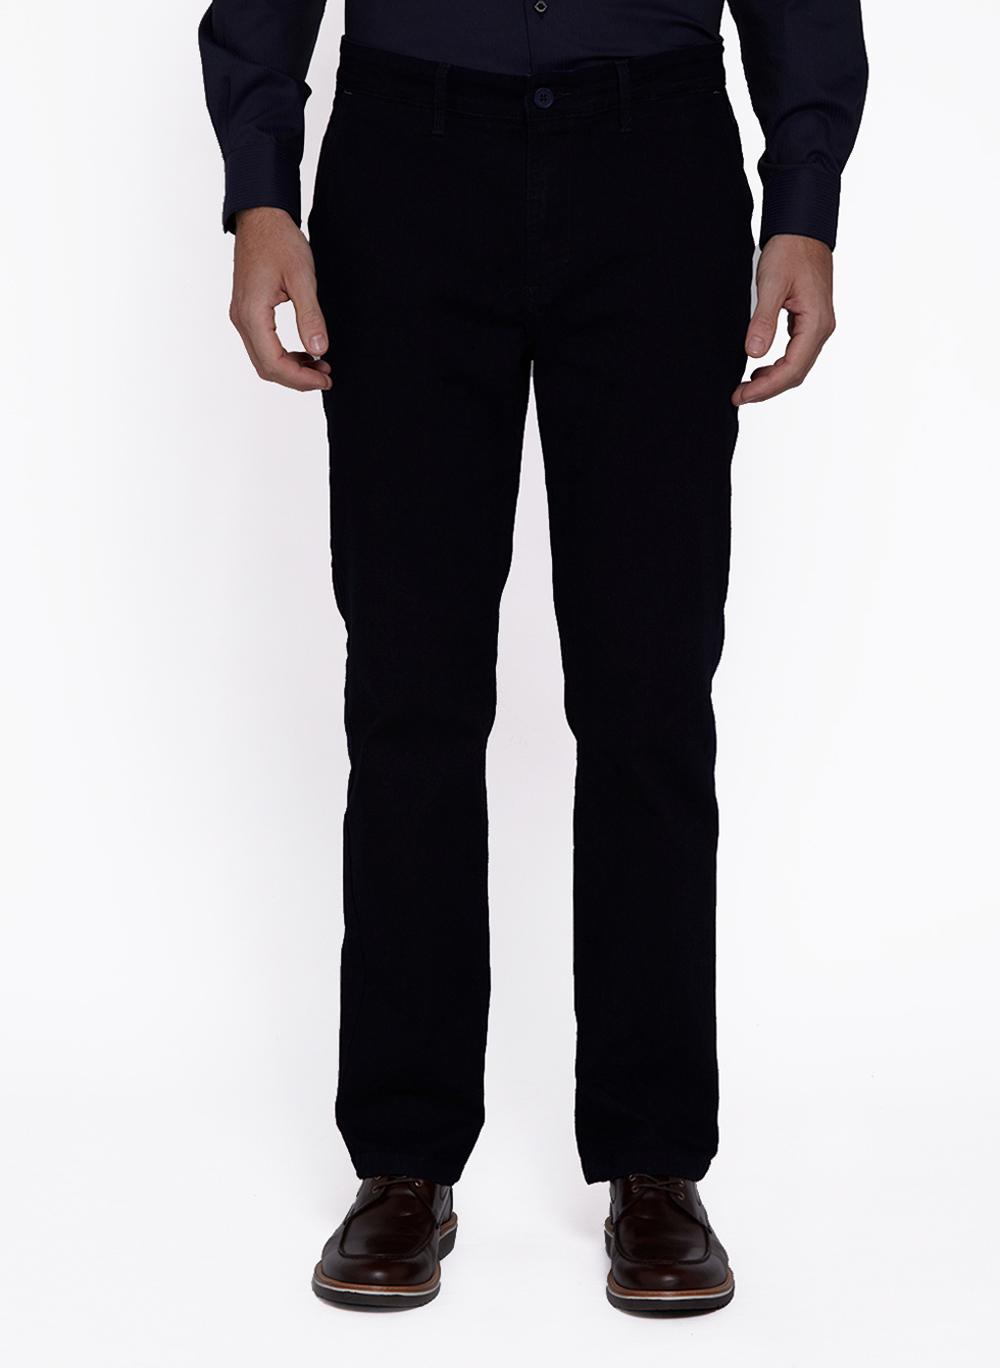 Calça Jeans Bolso Faca Masculina Right Fit Individual